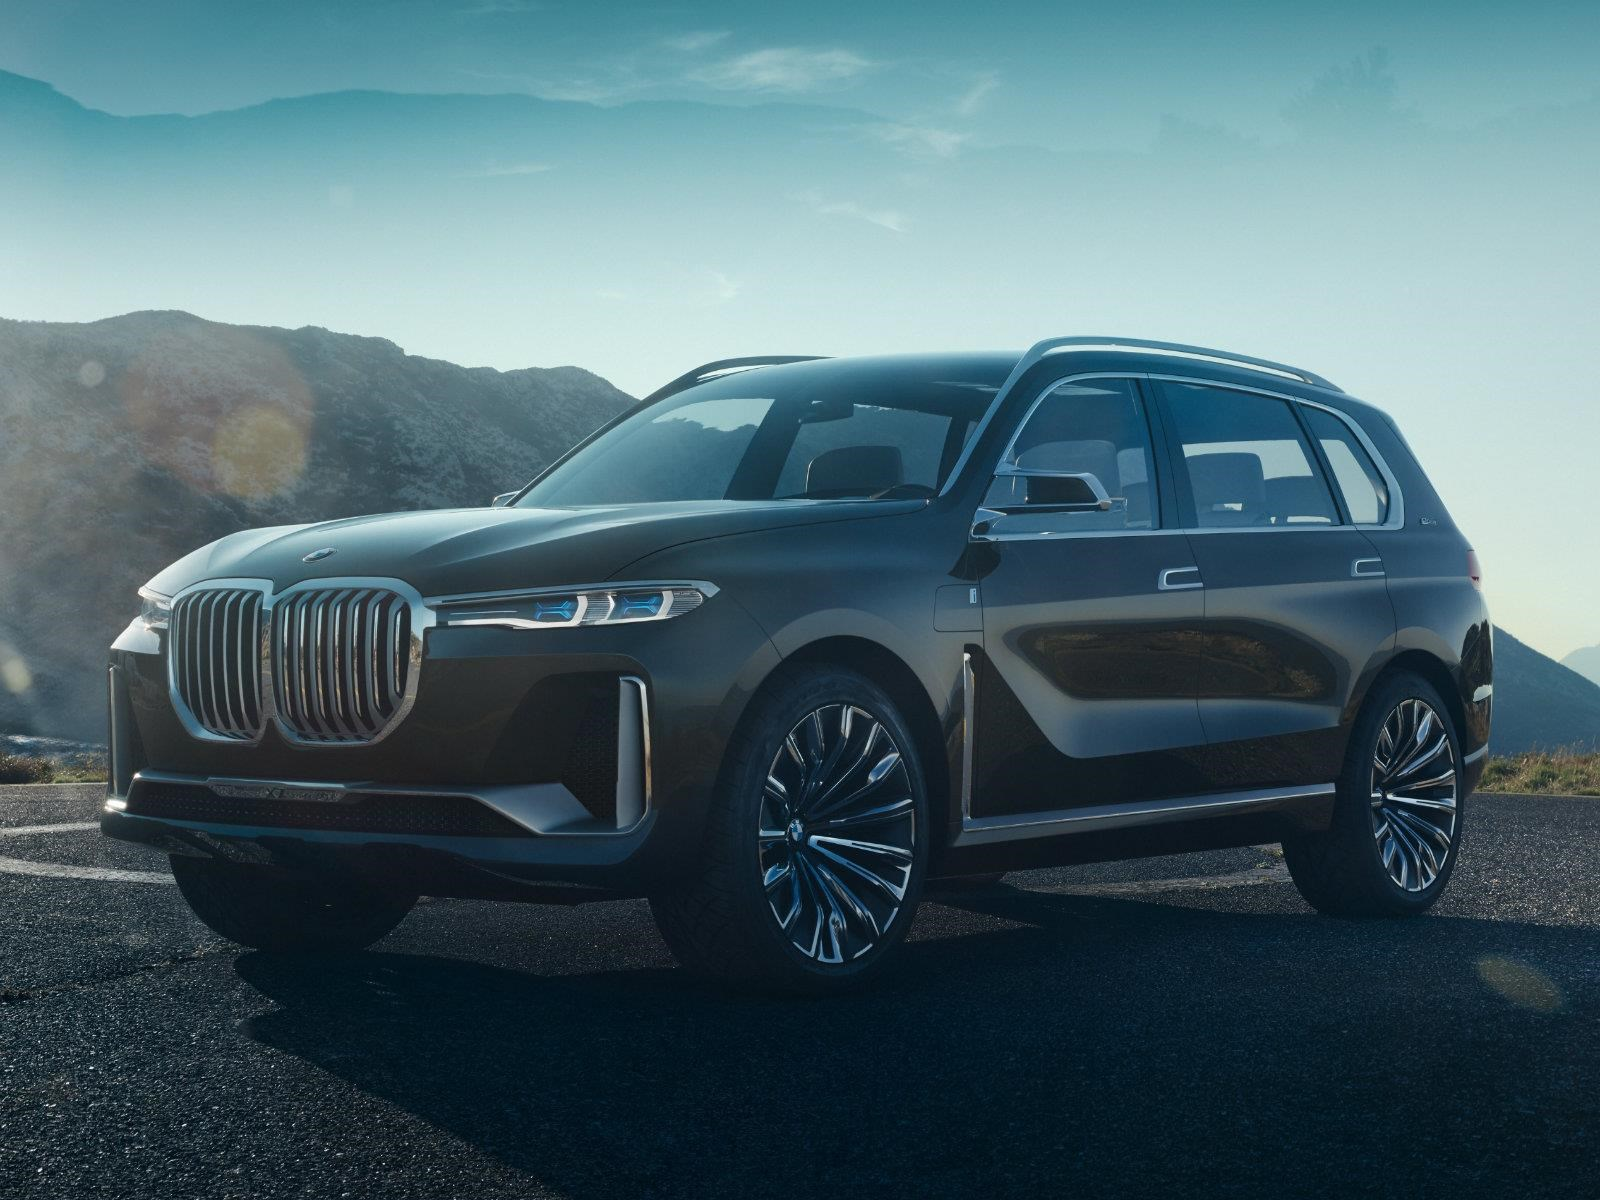 BMW Concept X7 iPerformance debuta